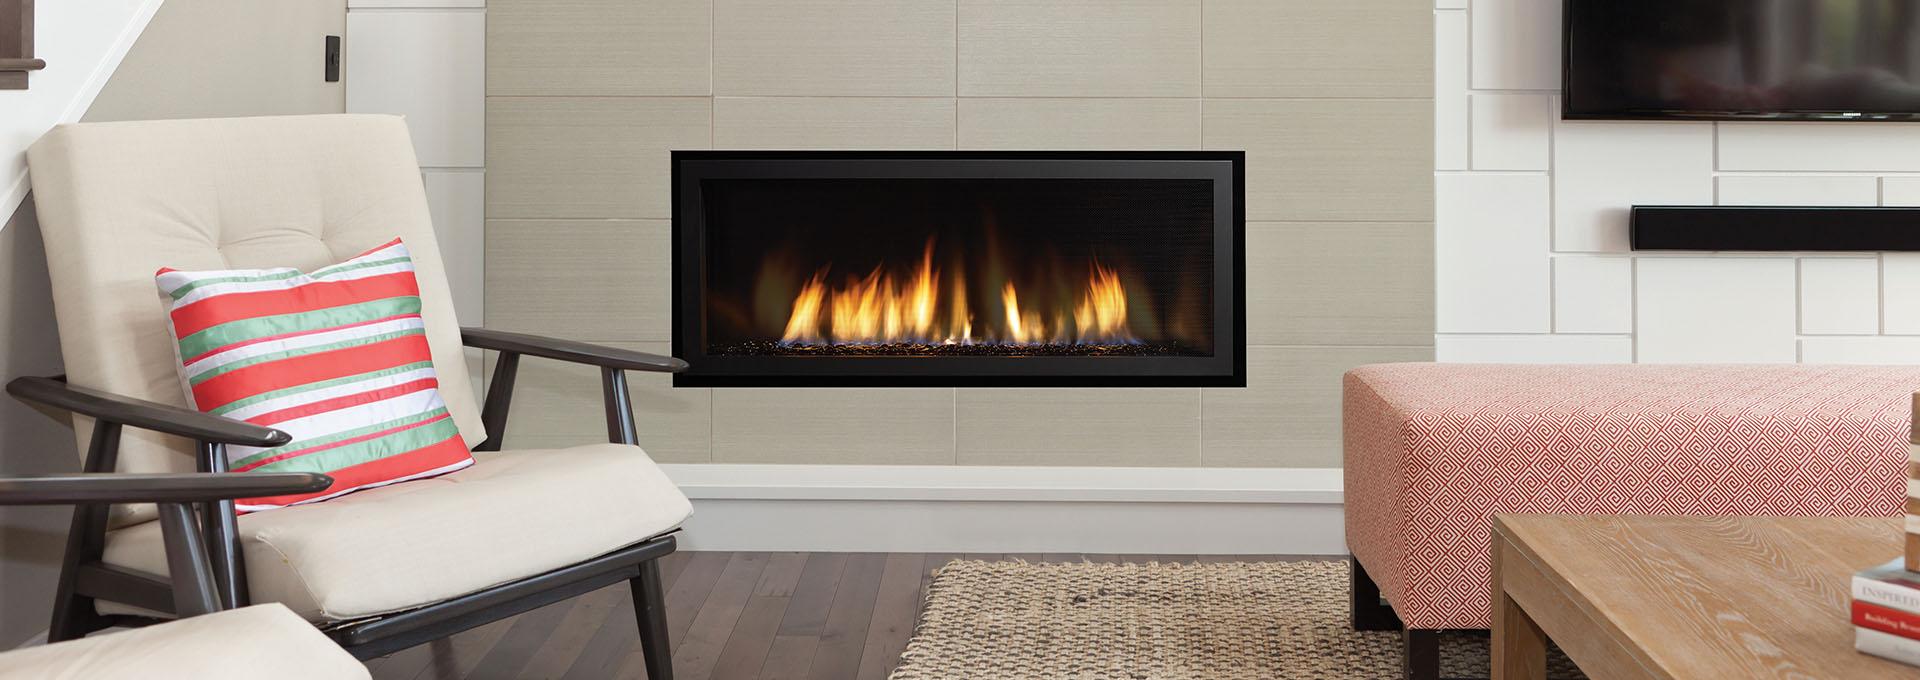 Gas Fireplace Insert Vs Wood Burning Installation